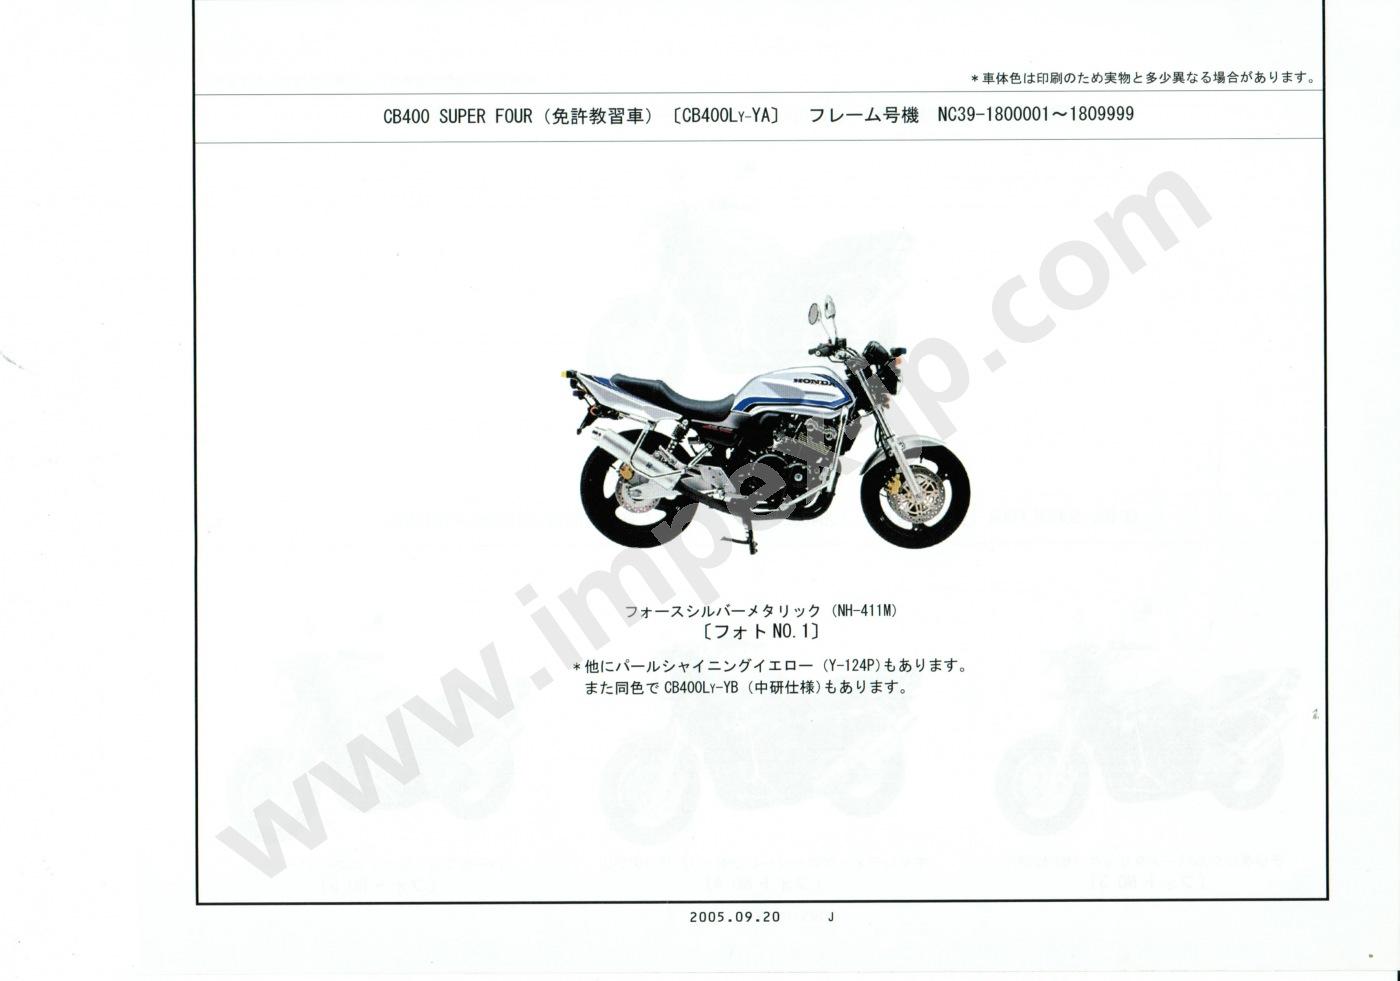 motorcycle parts honda cb400 super four training vehicle nc39 180 rh en impex jp com Heavy Equipment Manuals Owner's Manual